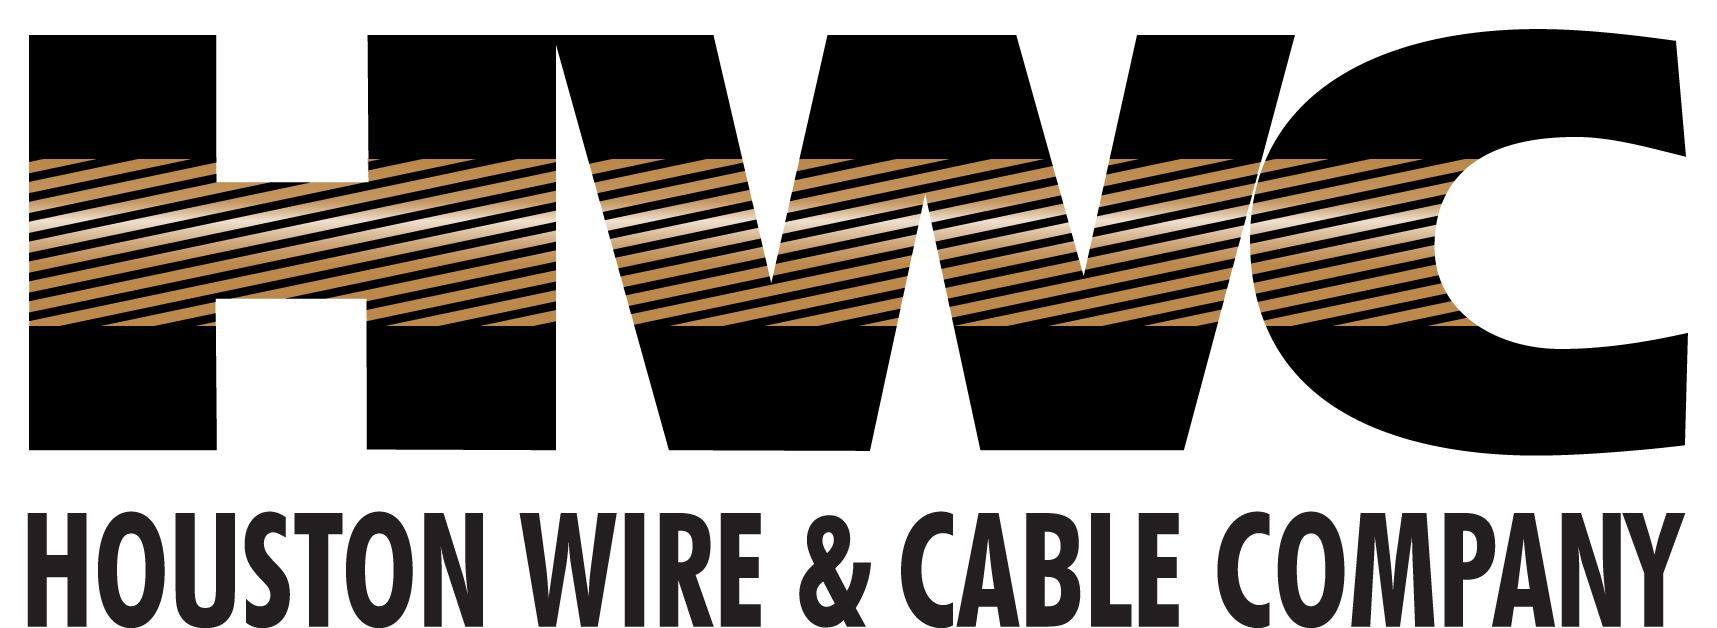 Houston Wire & Cable Company logo